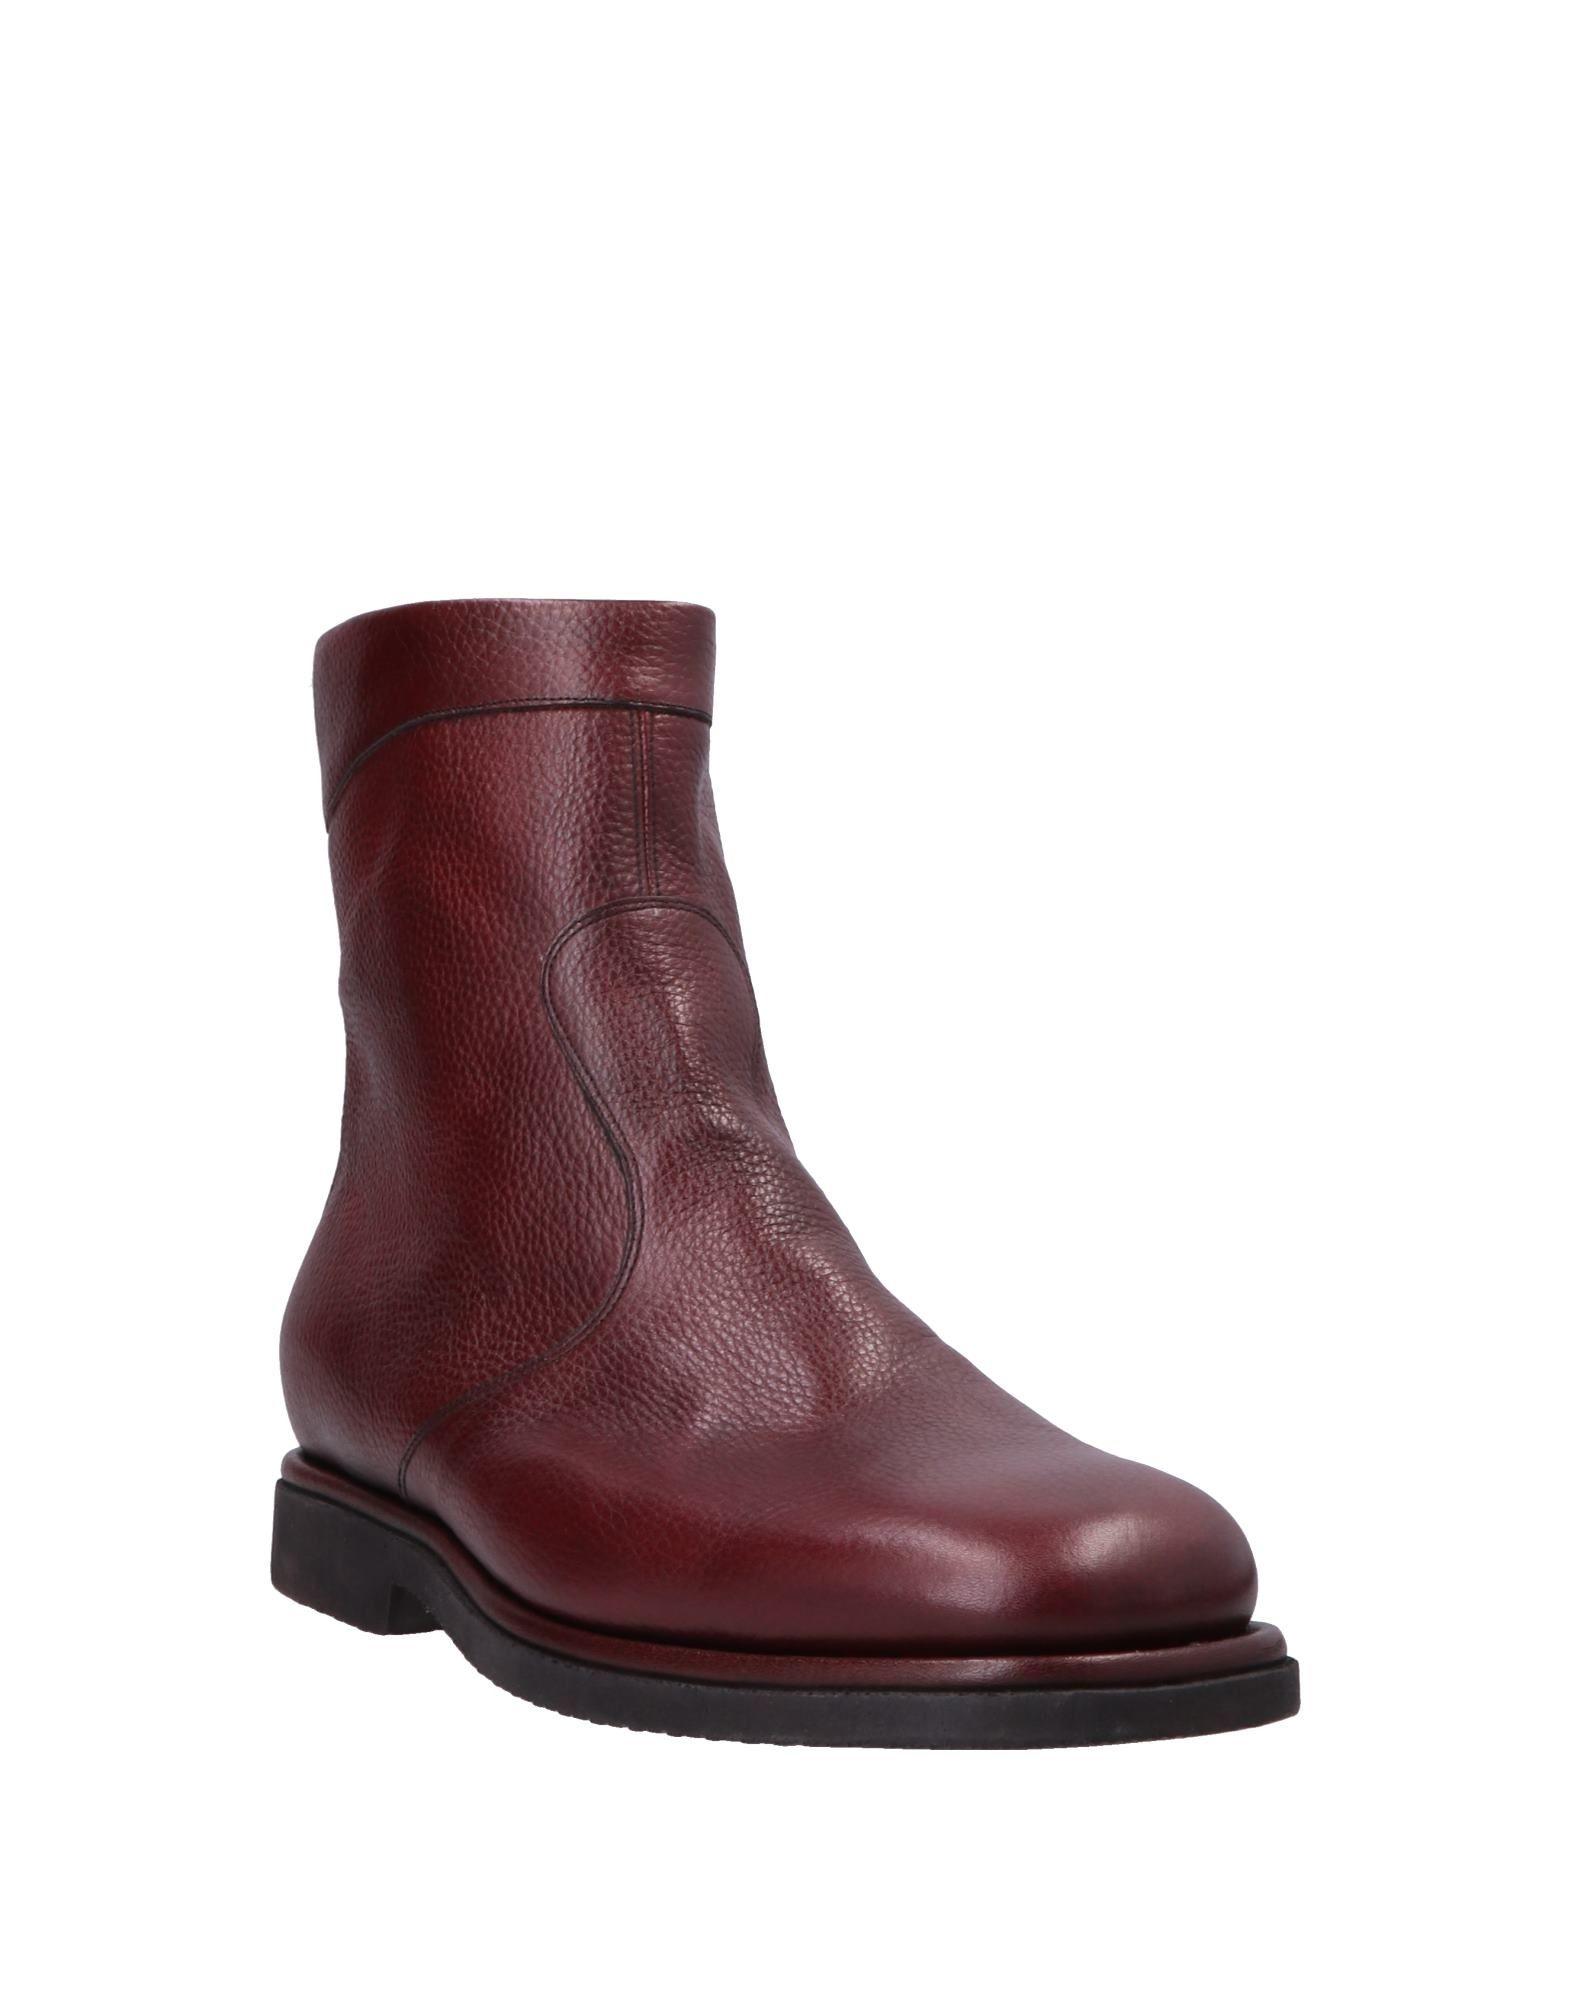 Rabatt Taurus echte Schuhe Taurus Rabatt Stiefelette Herren  11555964AT 8260ea